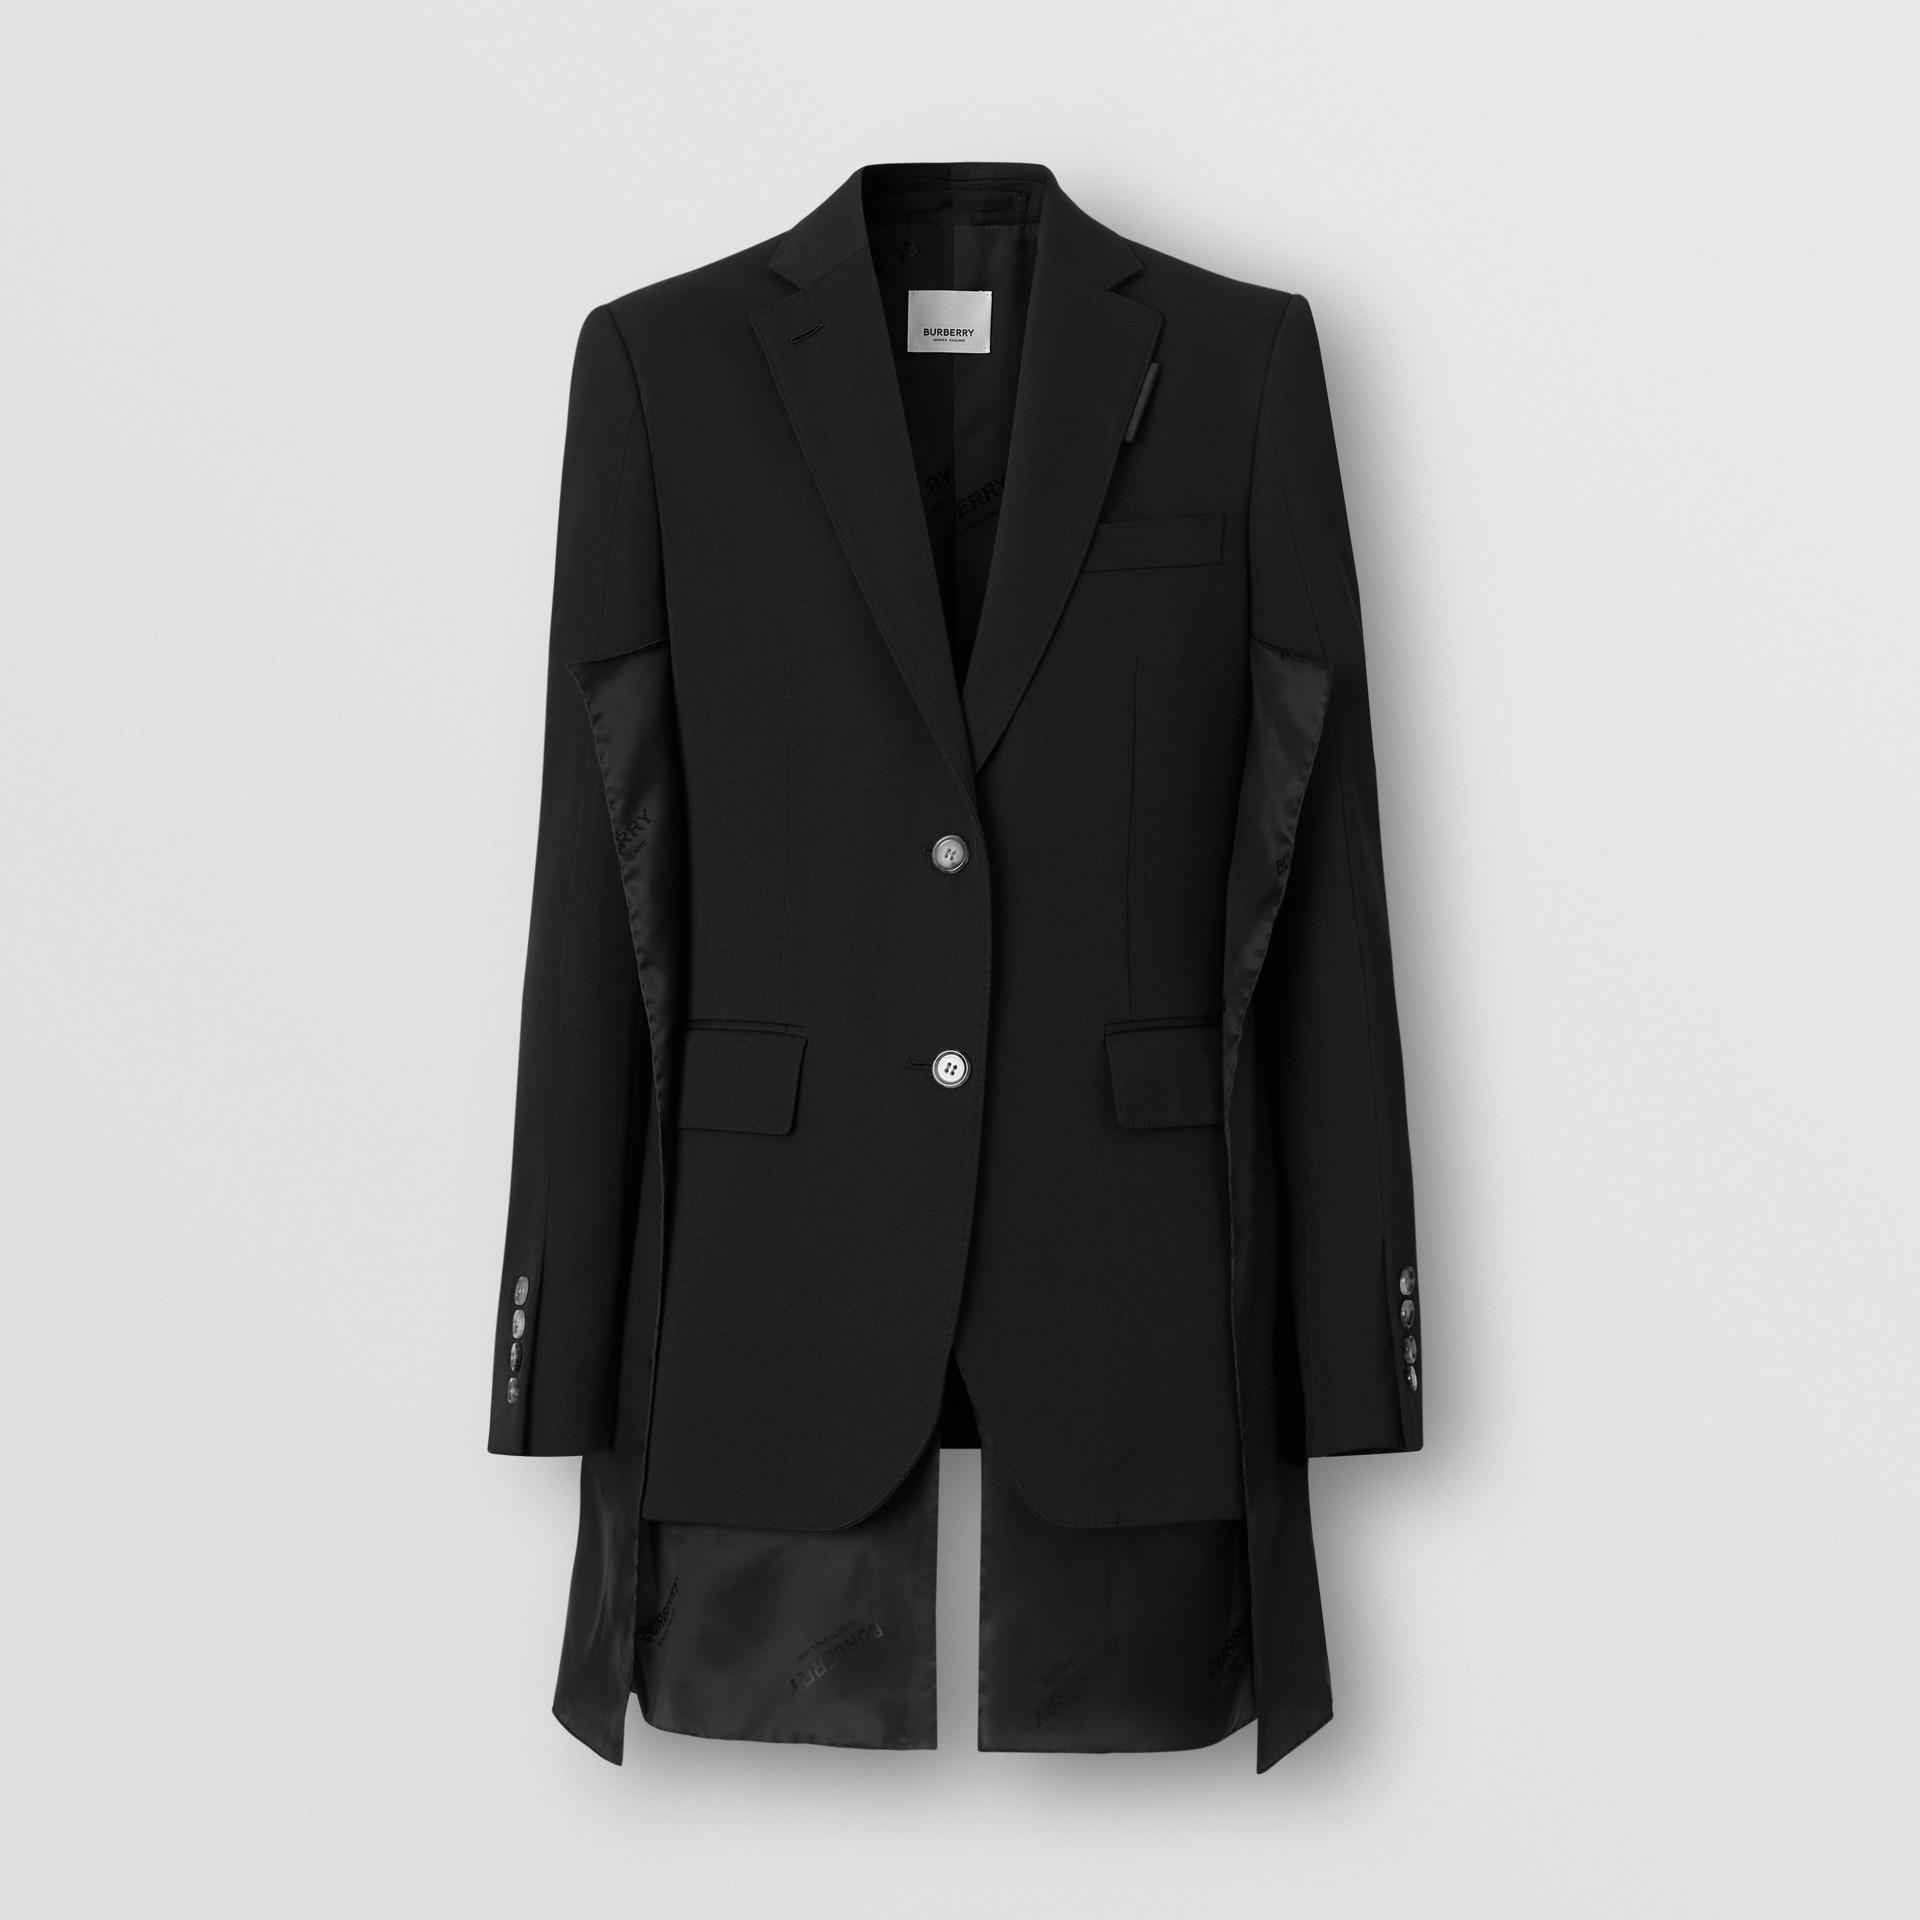 Logo Panel Detail Wool Tailored Jacket in Black - Women | Burberry Australia - gallery image 3